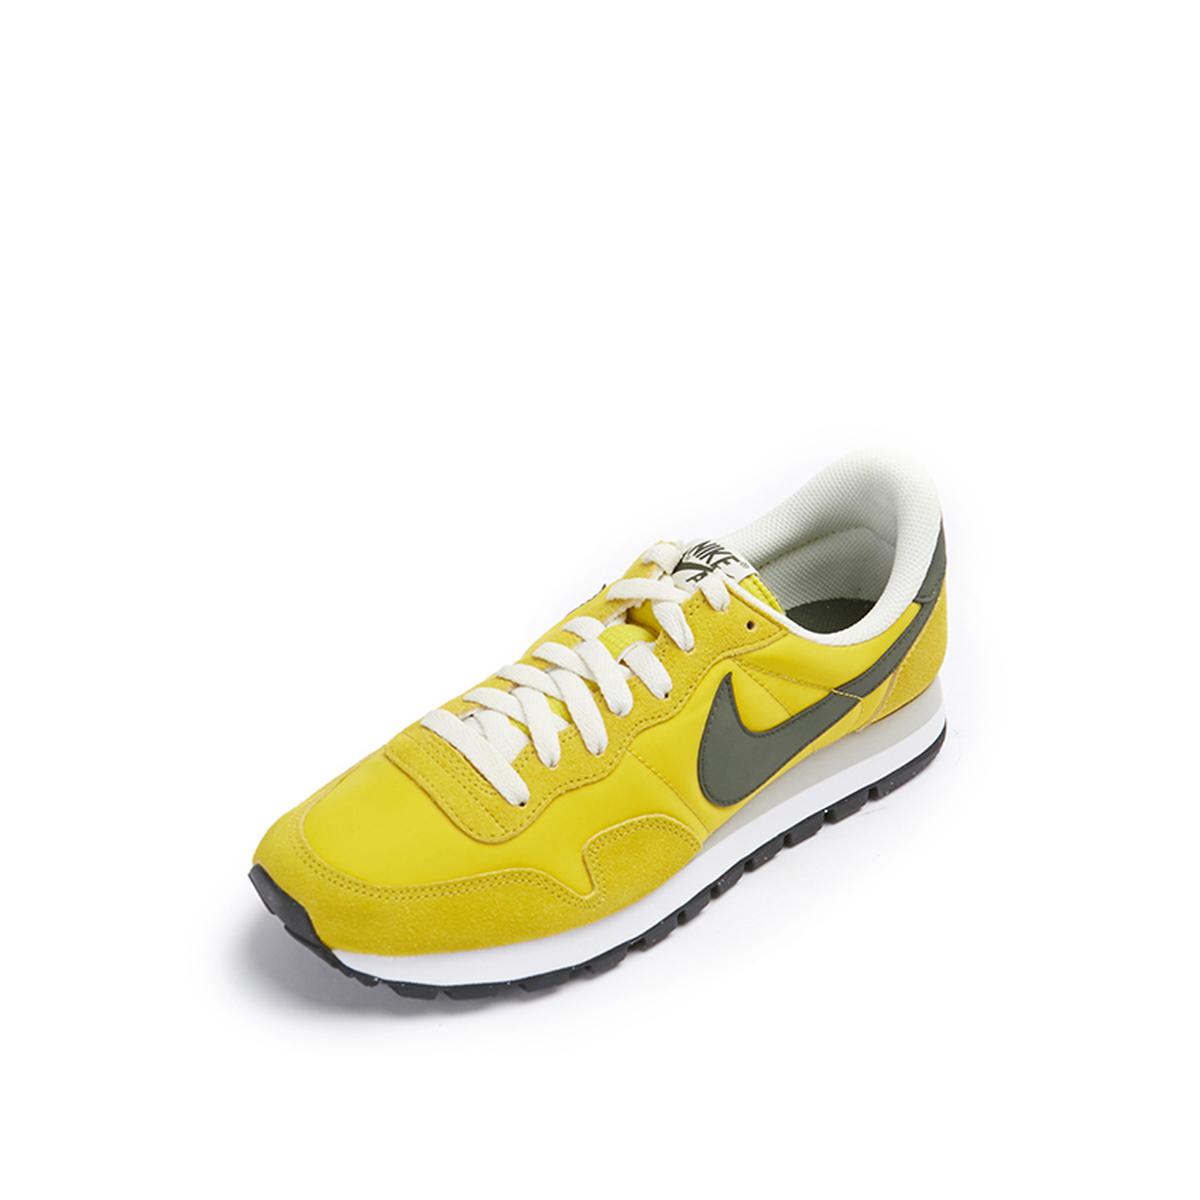 فعلتها مبالغة صعب Retro Nike Shoes Mens Dsvdedommel Com